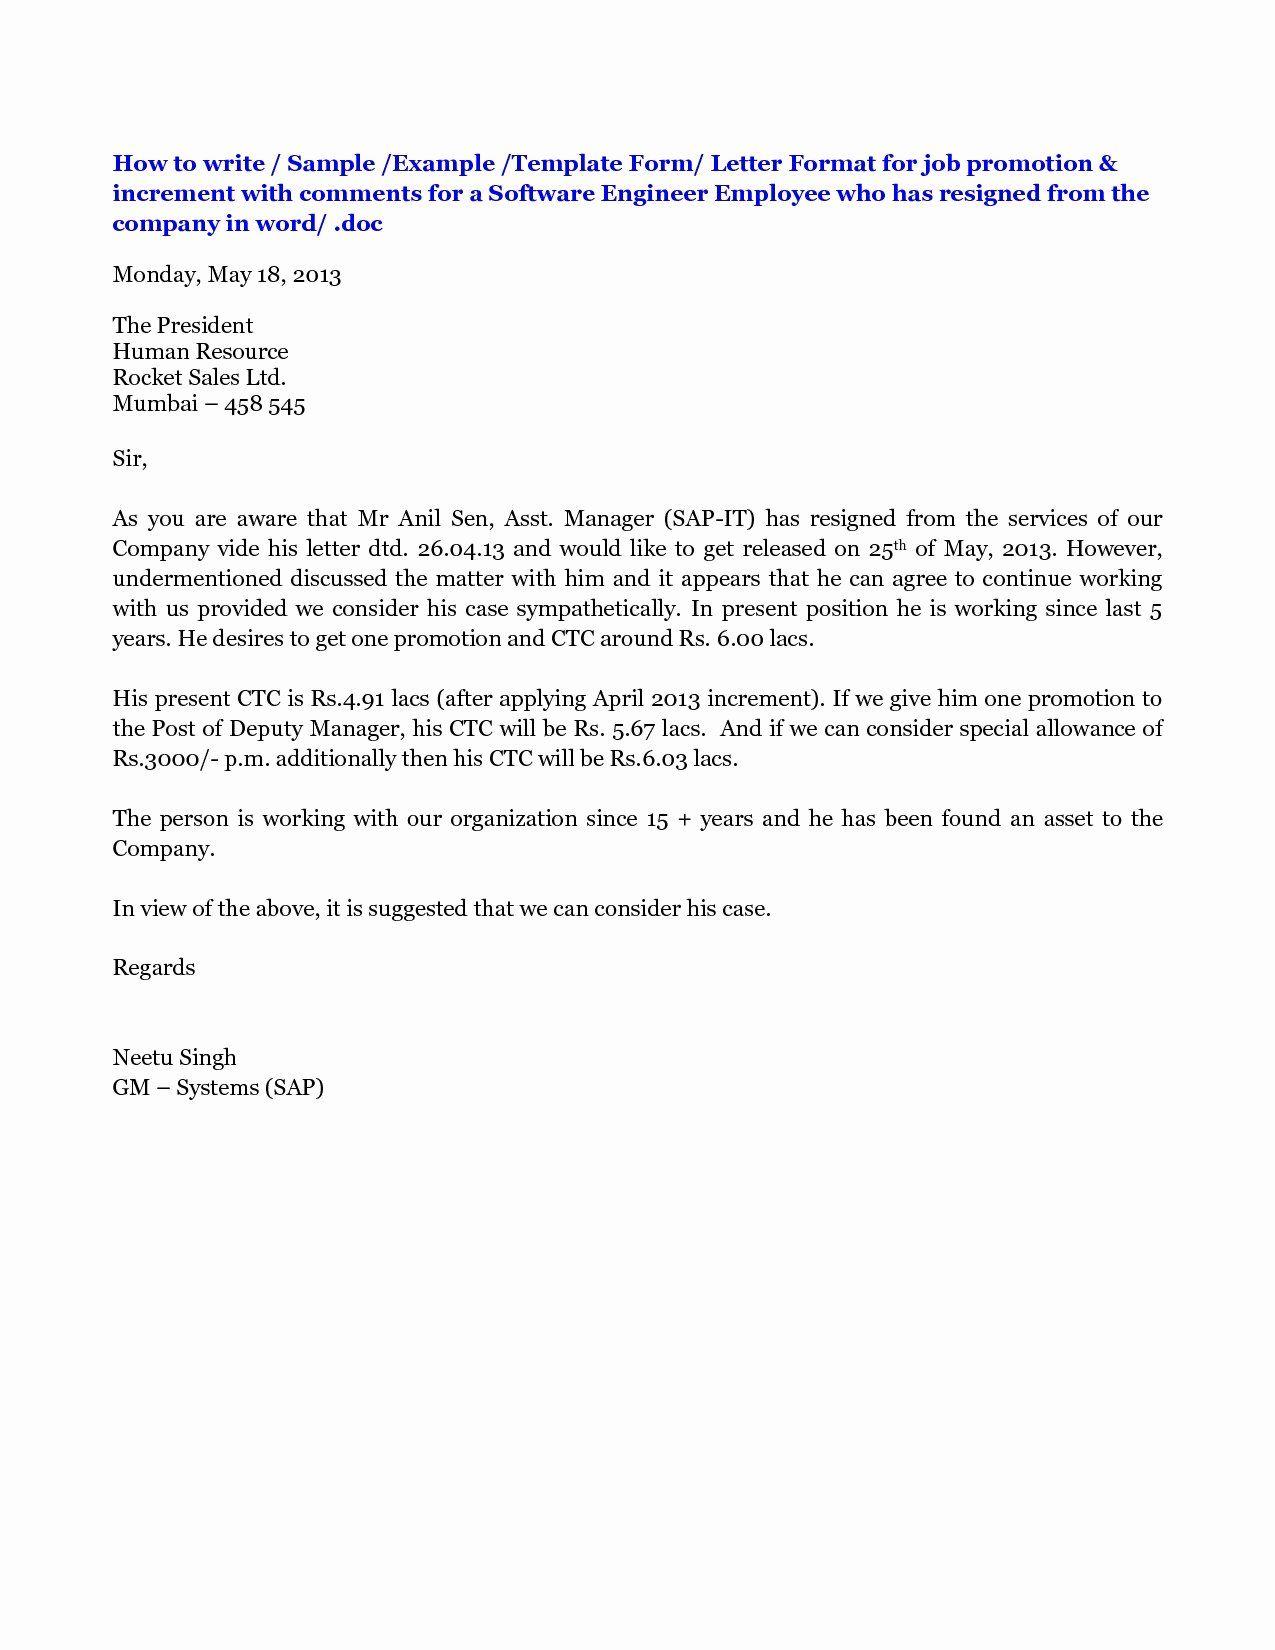 letter for professor promotion fresh 12 call center resume sample profile summary fresher civil engineer career objective economics graduate